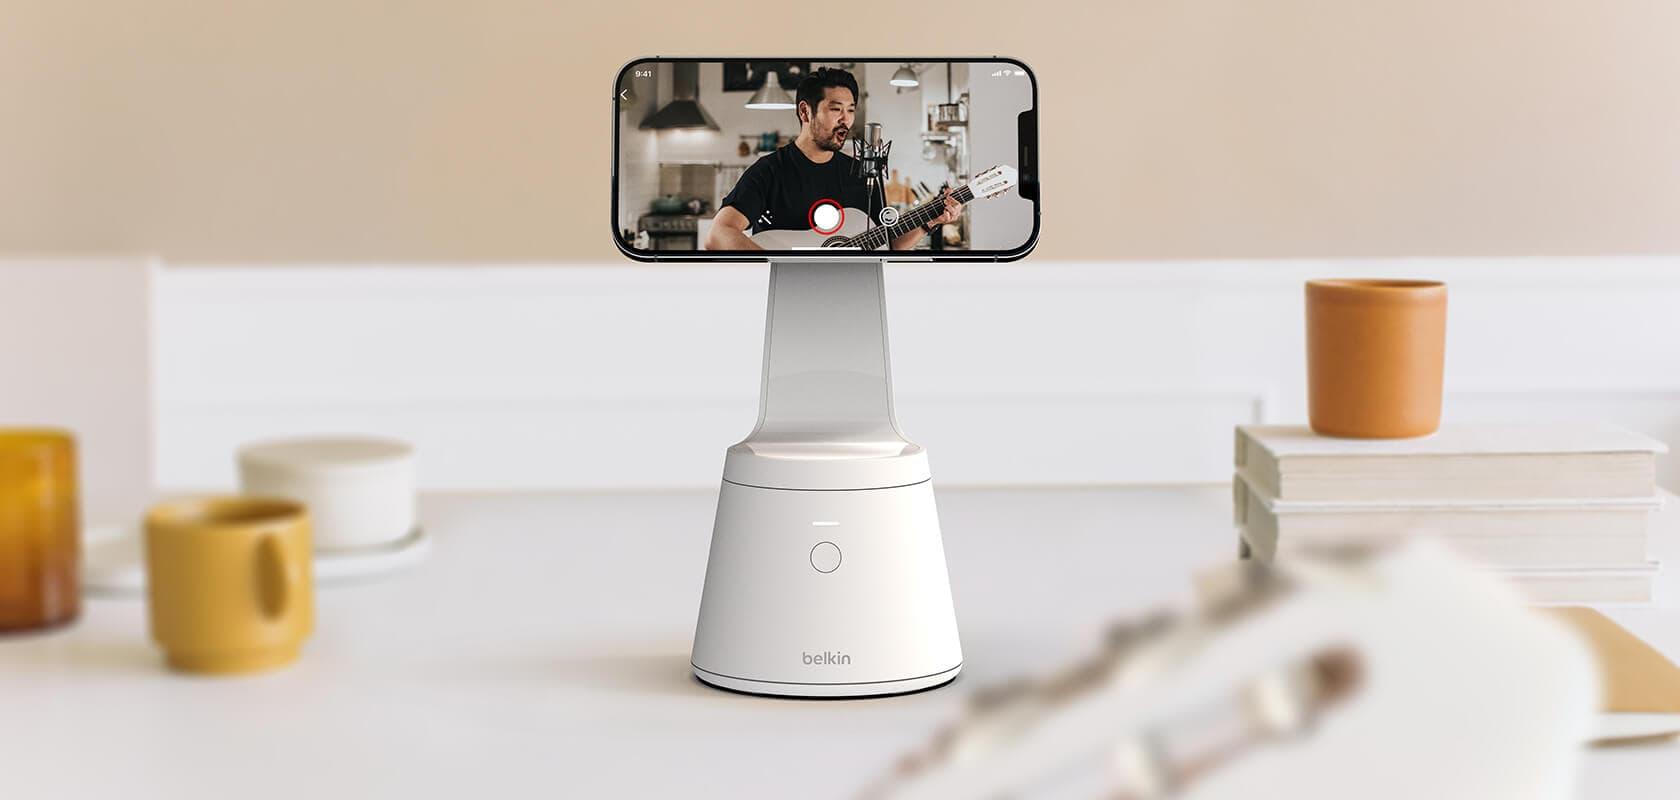 Belkin Magnetic Phone Mount Face Tracking stacja ze śledzeniem twarzy do iPhone'a 12